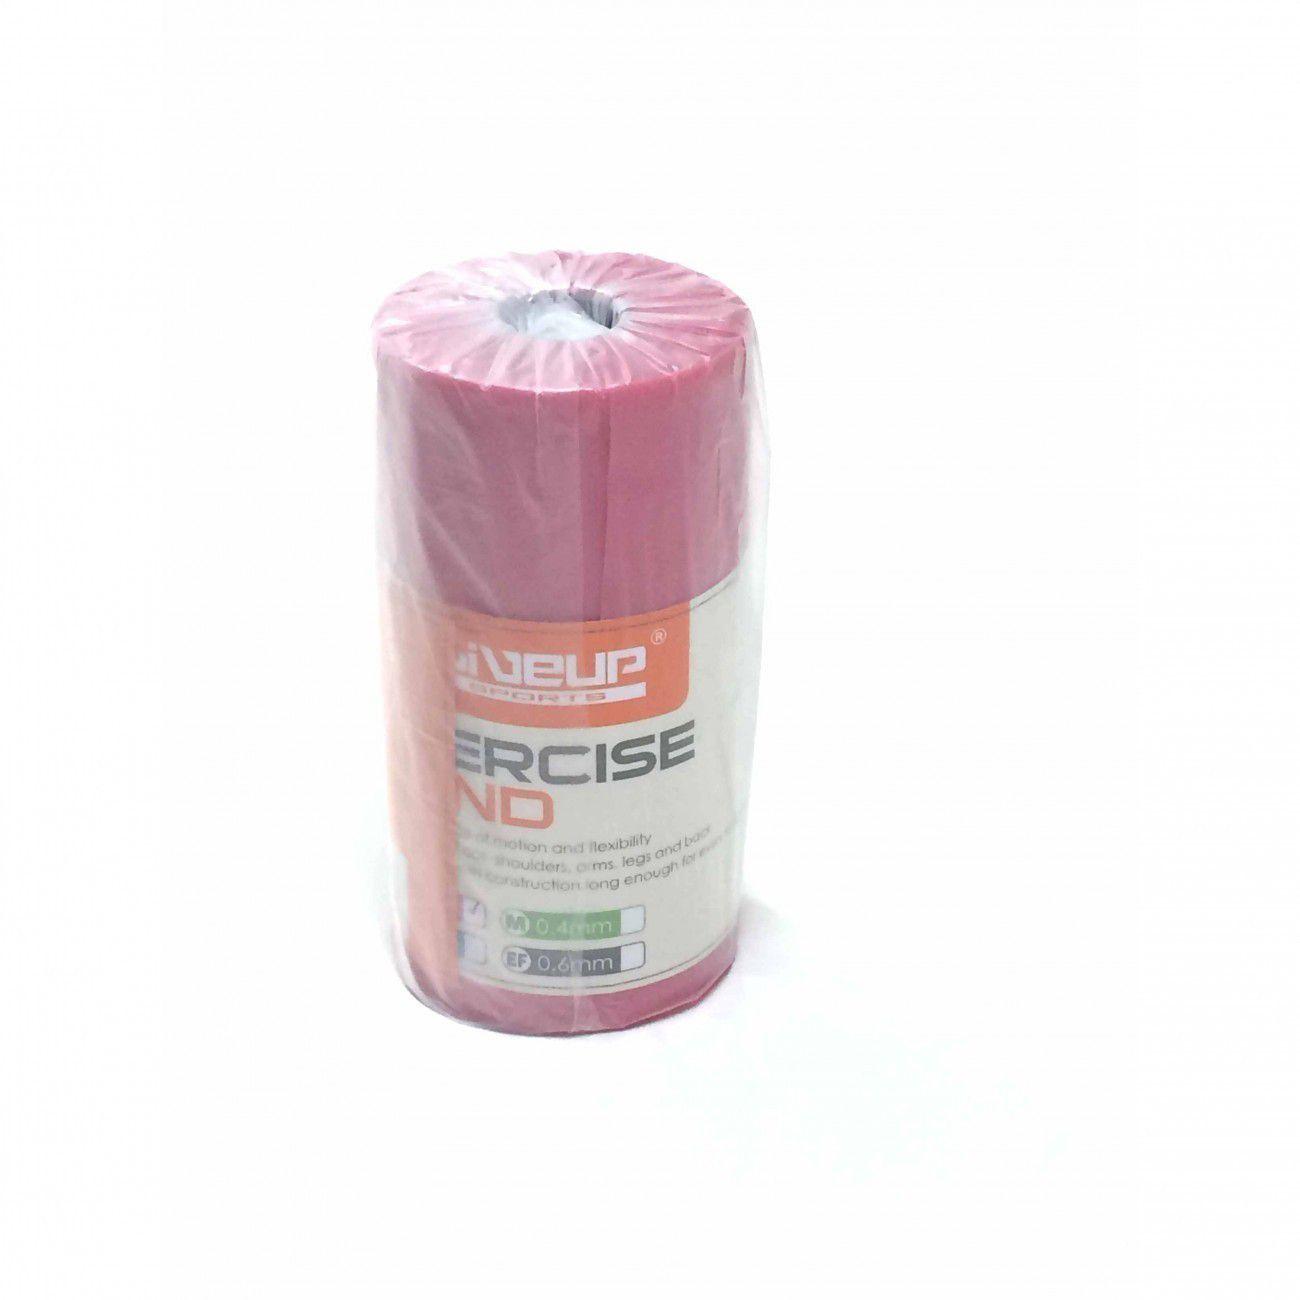 Rolo de Faixa Elástica Intensidade Leve - 12000x150x0.3mm - LiveUp